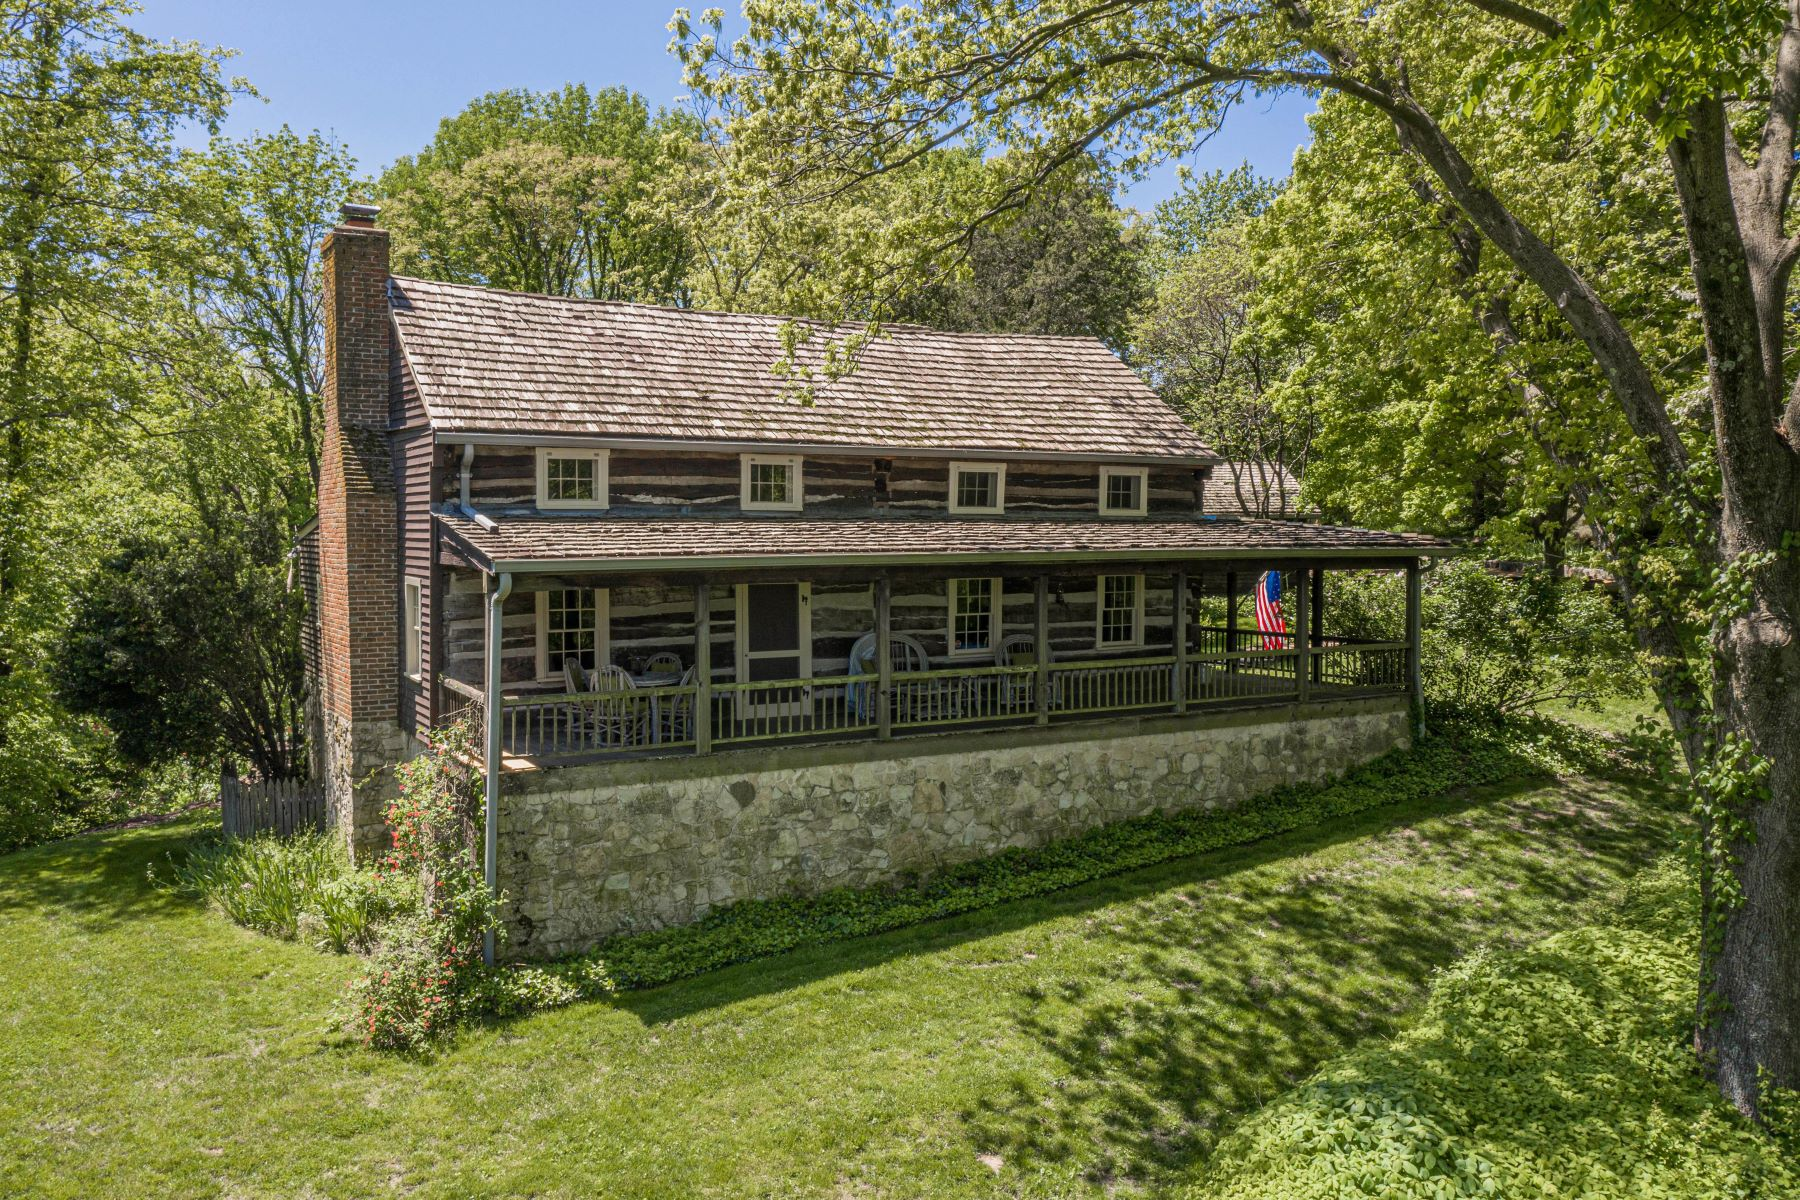 Single Family Homes for Sale at Enchanting Log Cabin Compound 984 Charrette Lane Washington, Missouri 63090 United States